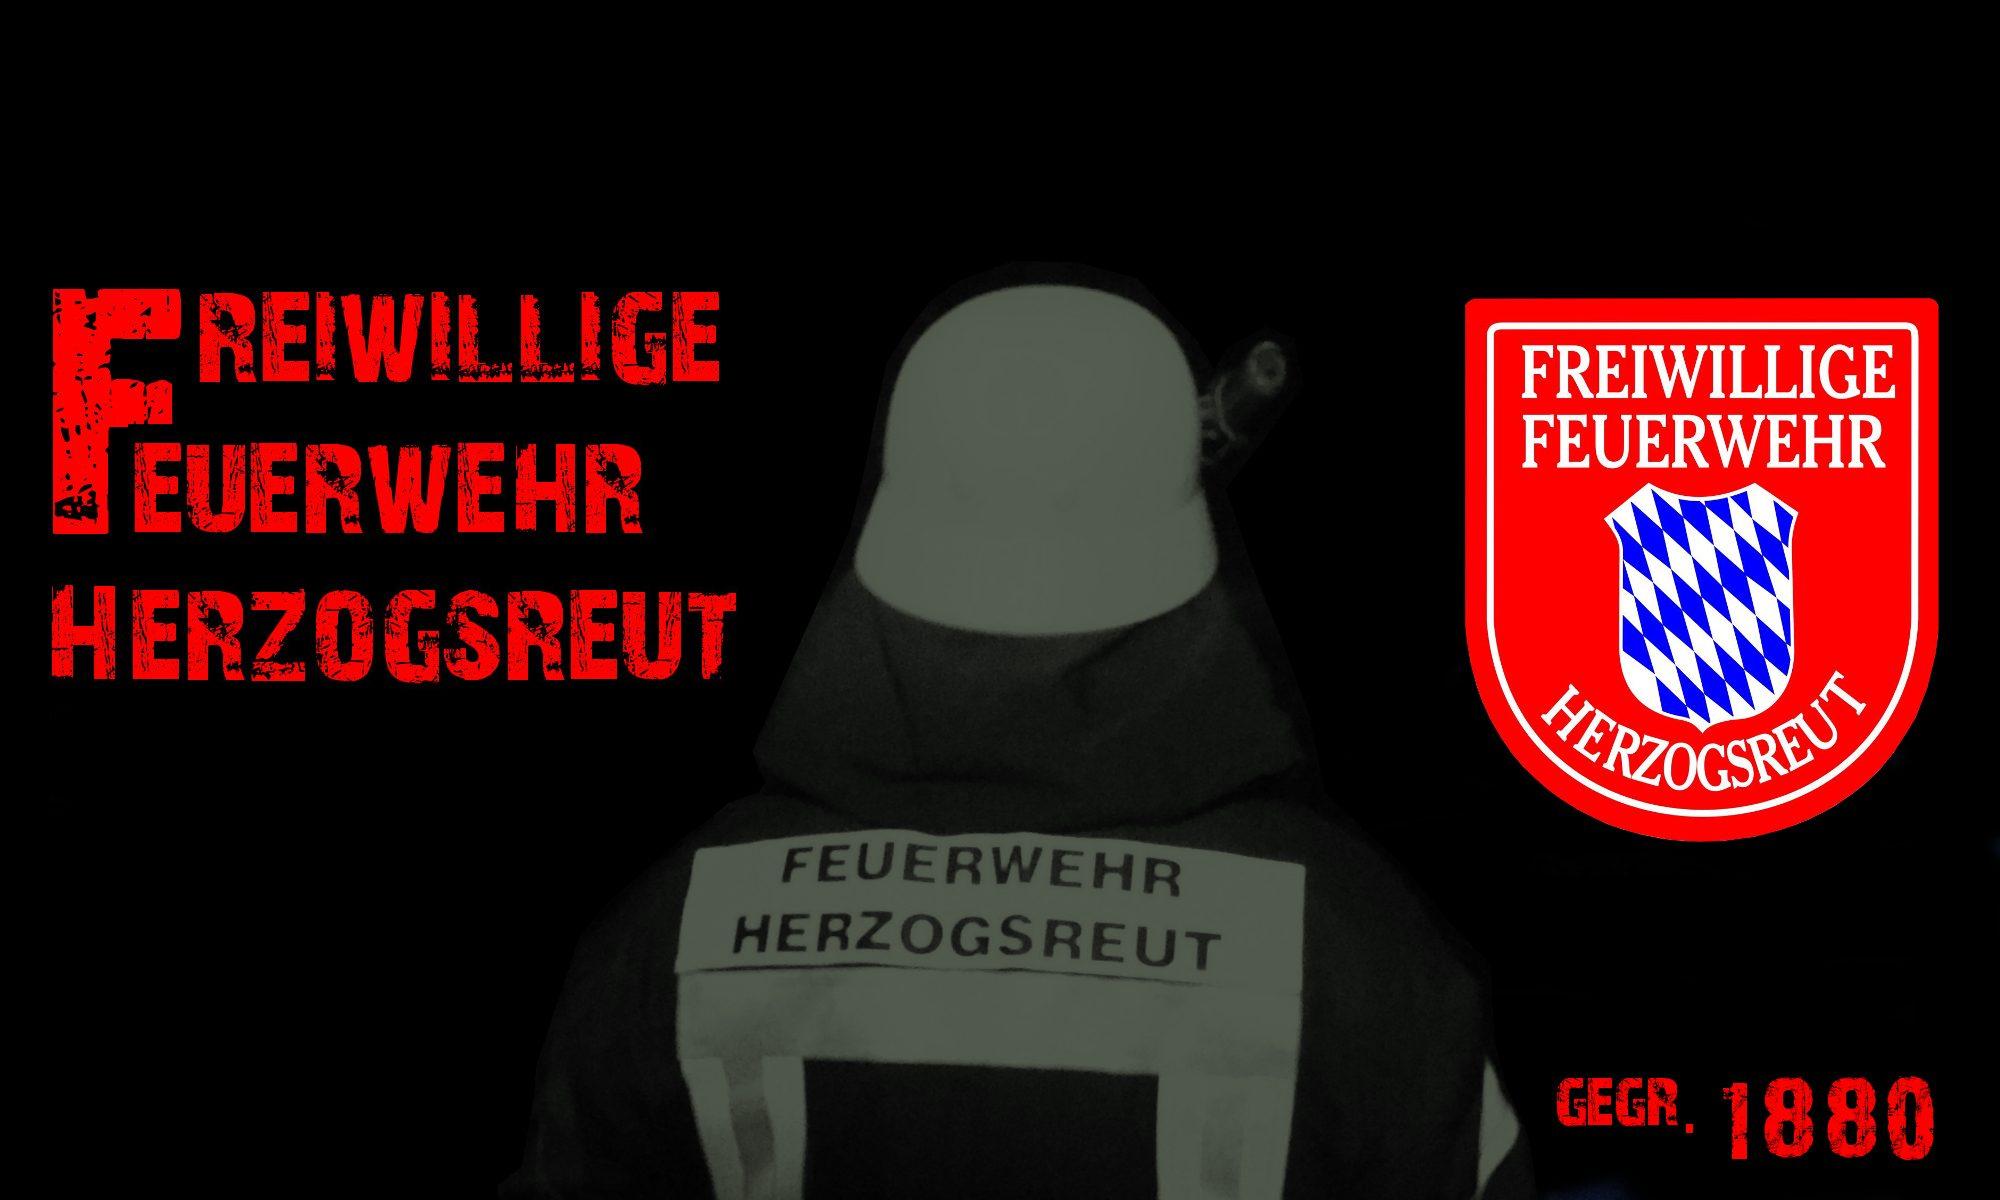 FFW Herzogsreut